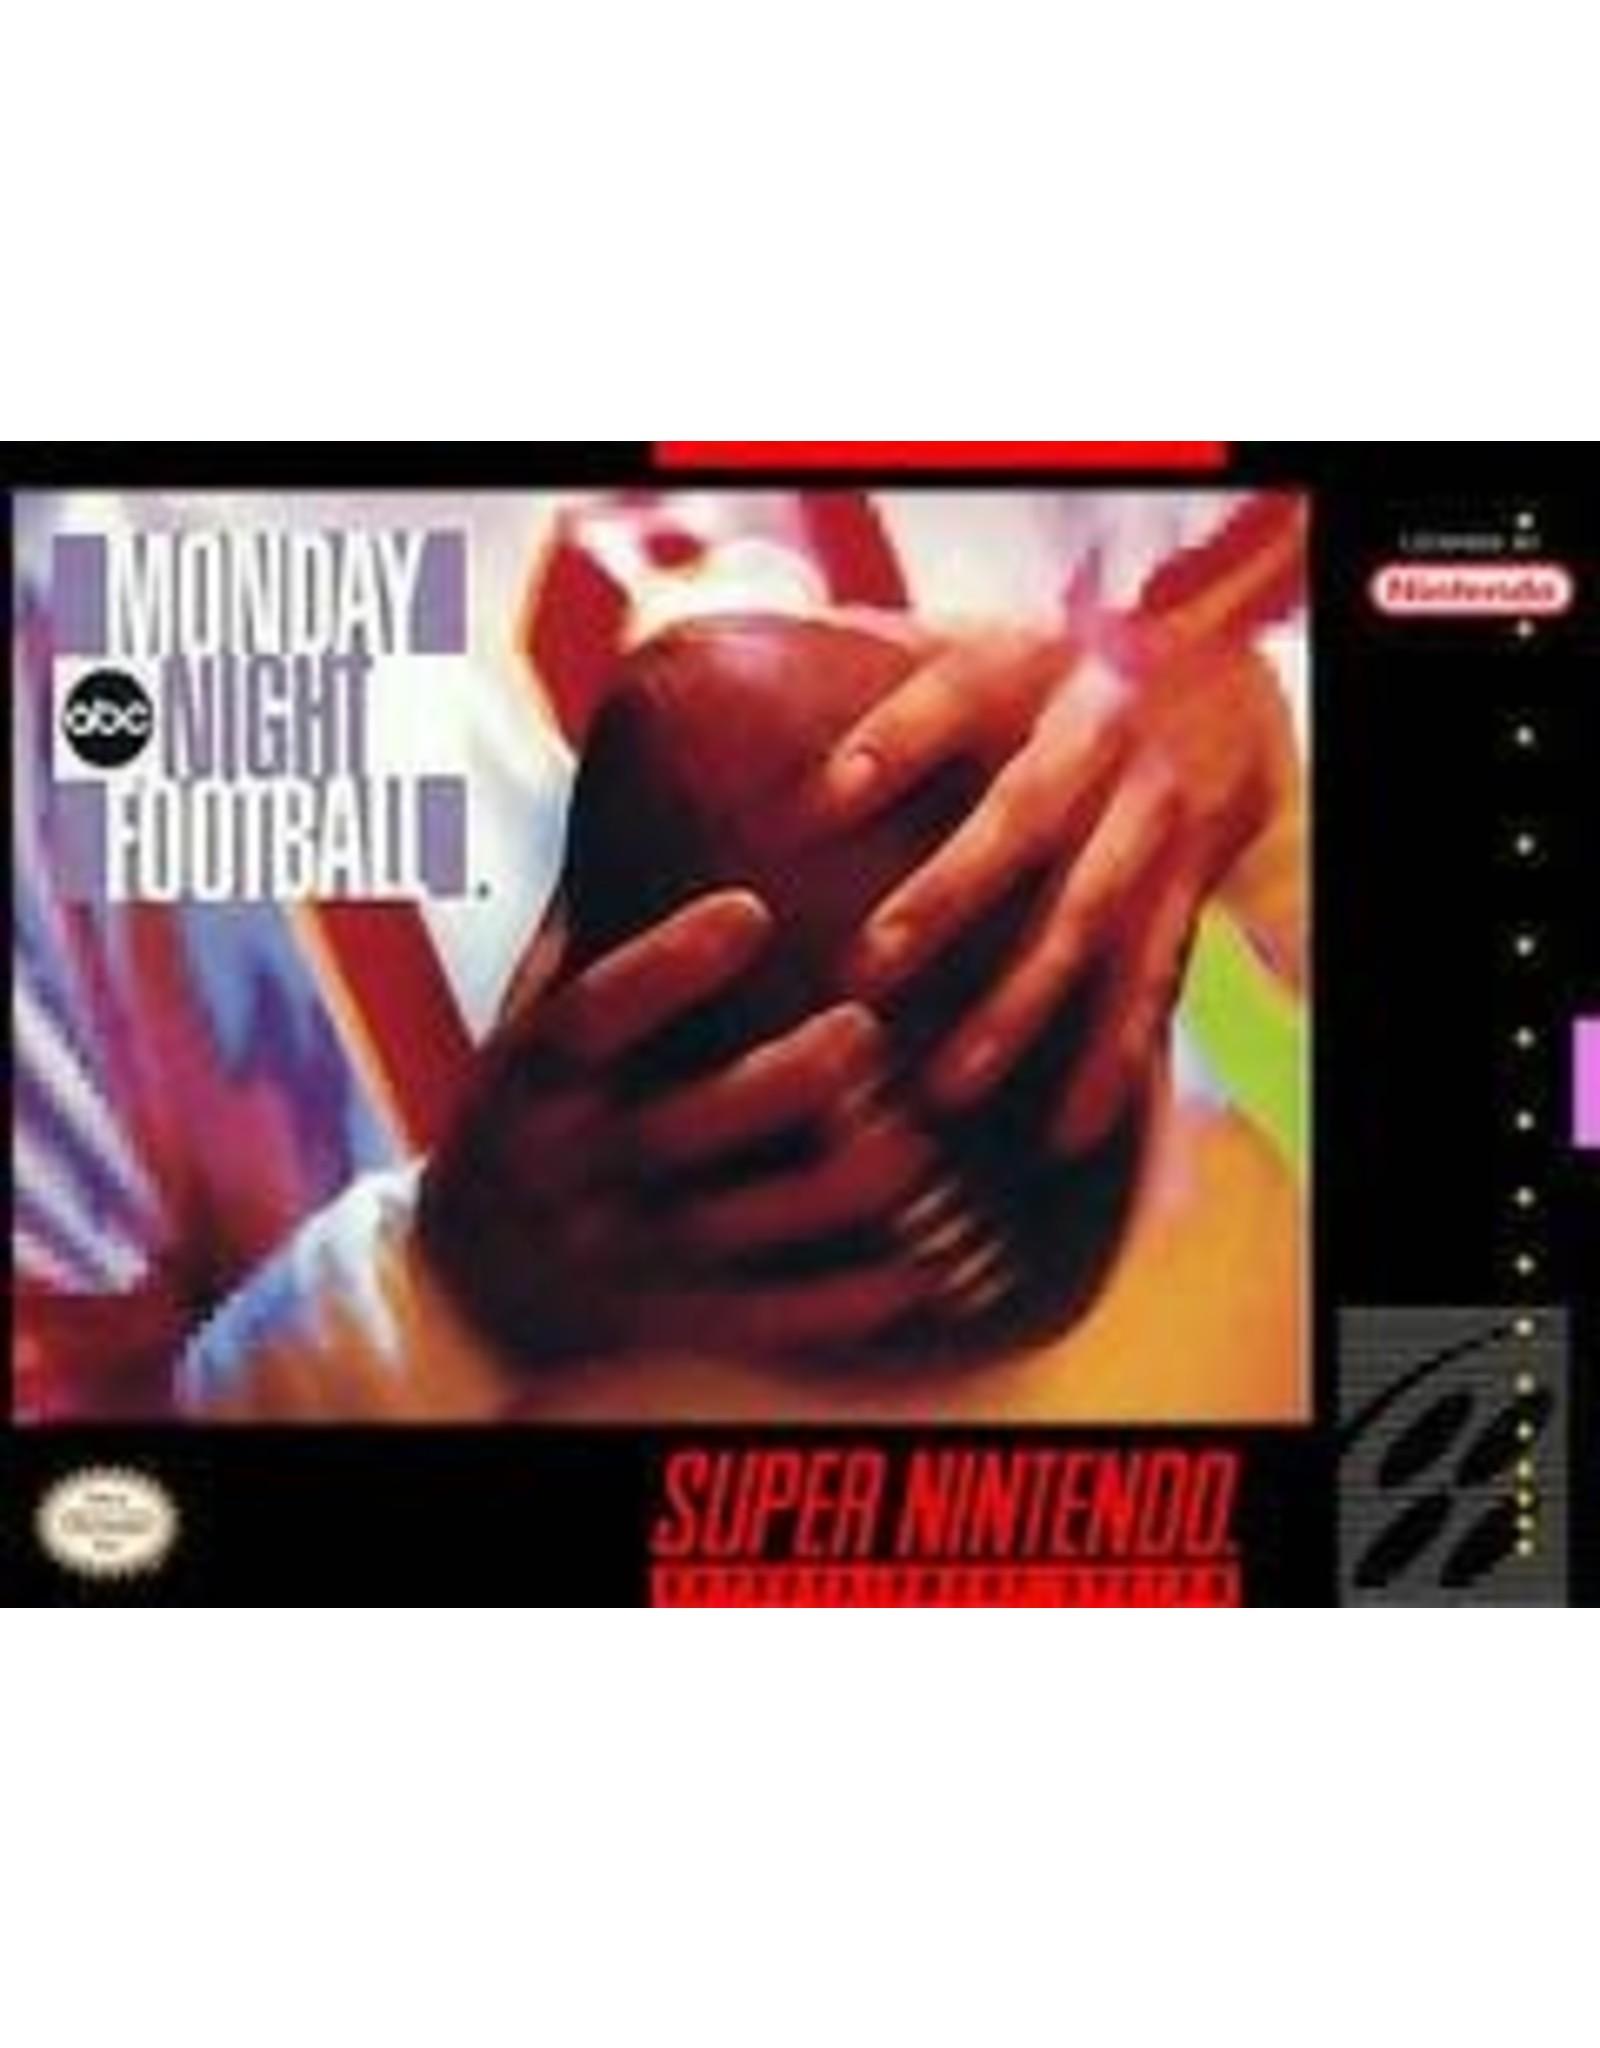 Super Nintendo ABC Monday Night Football (Cart Only)